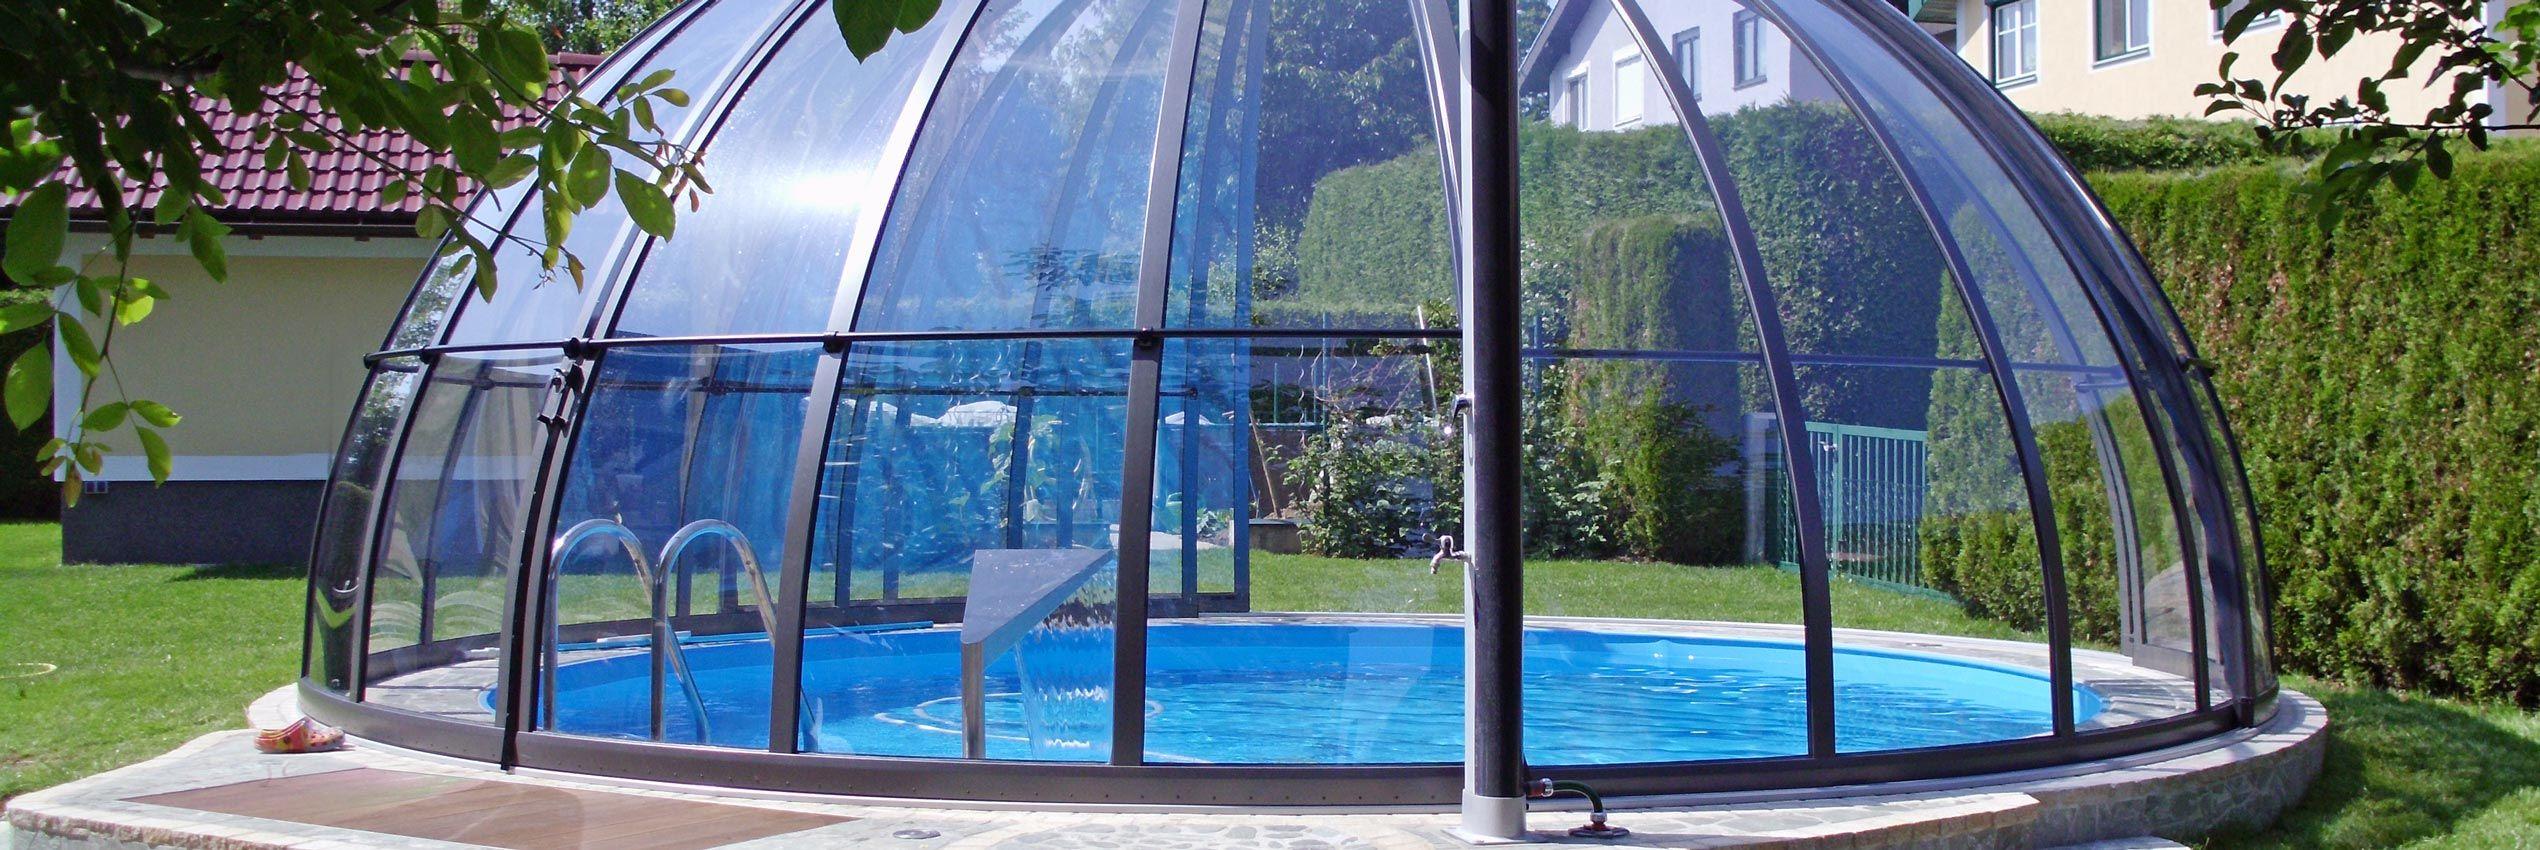 Copertura piscina distesa